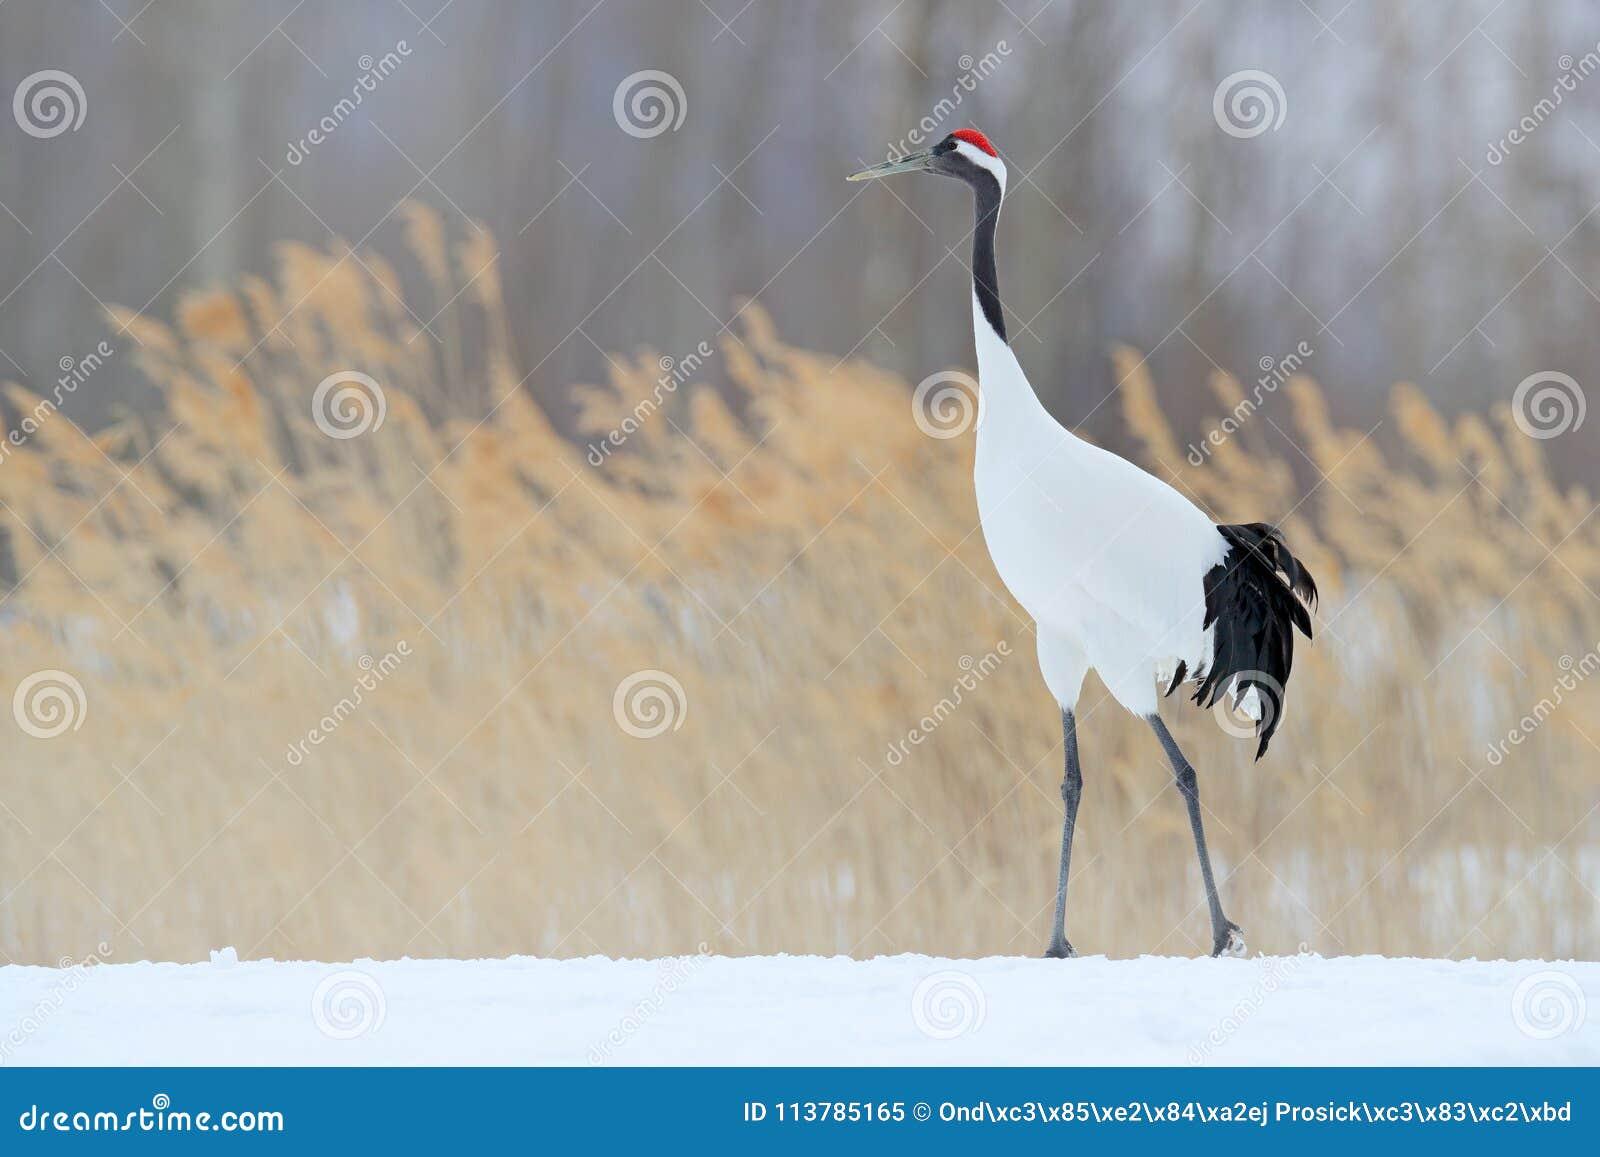 Red-crowned crane in snow meadow, with snow storm, Hokkaido, Japan. Bird walking in snow. Crane dance in nature. Wildlife scene f